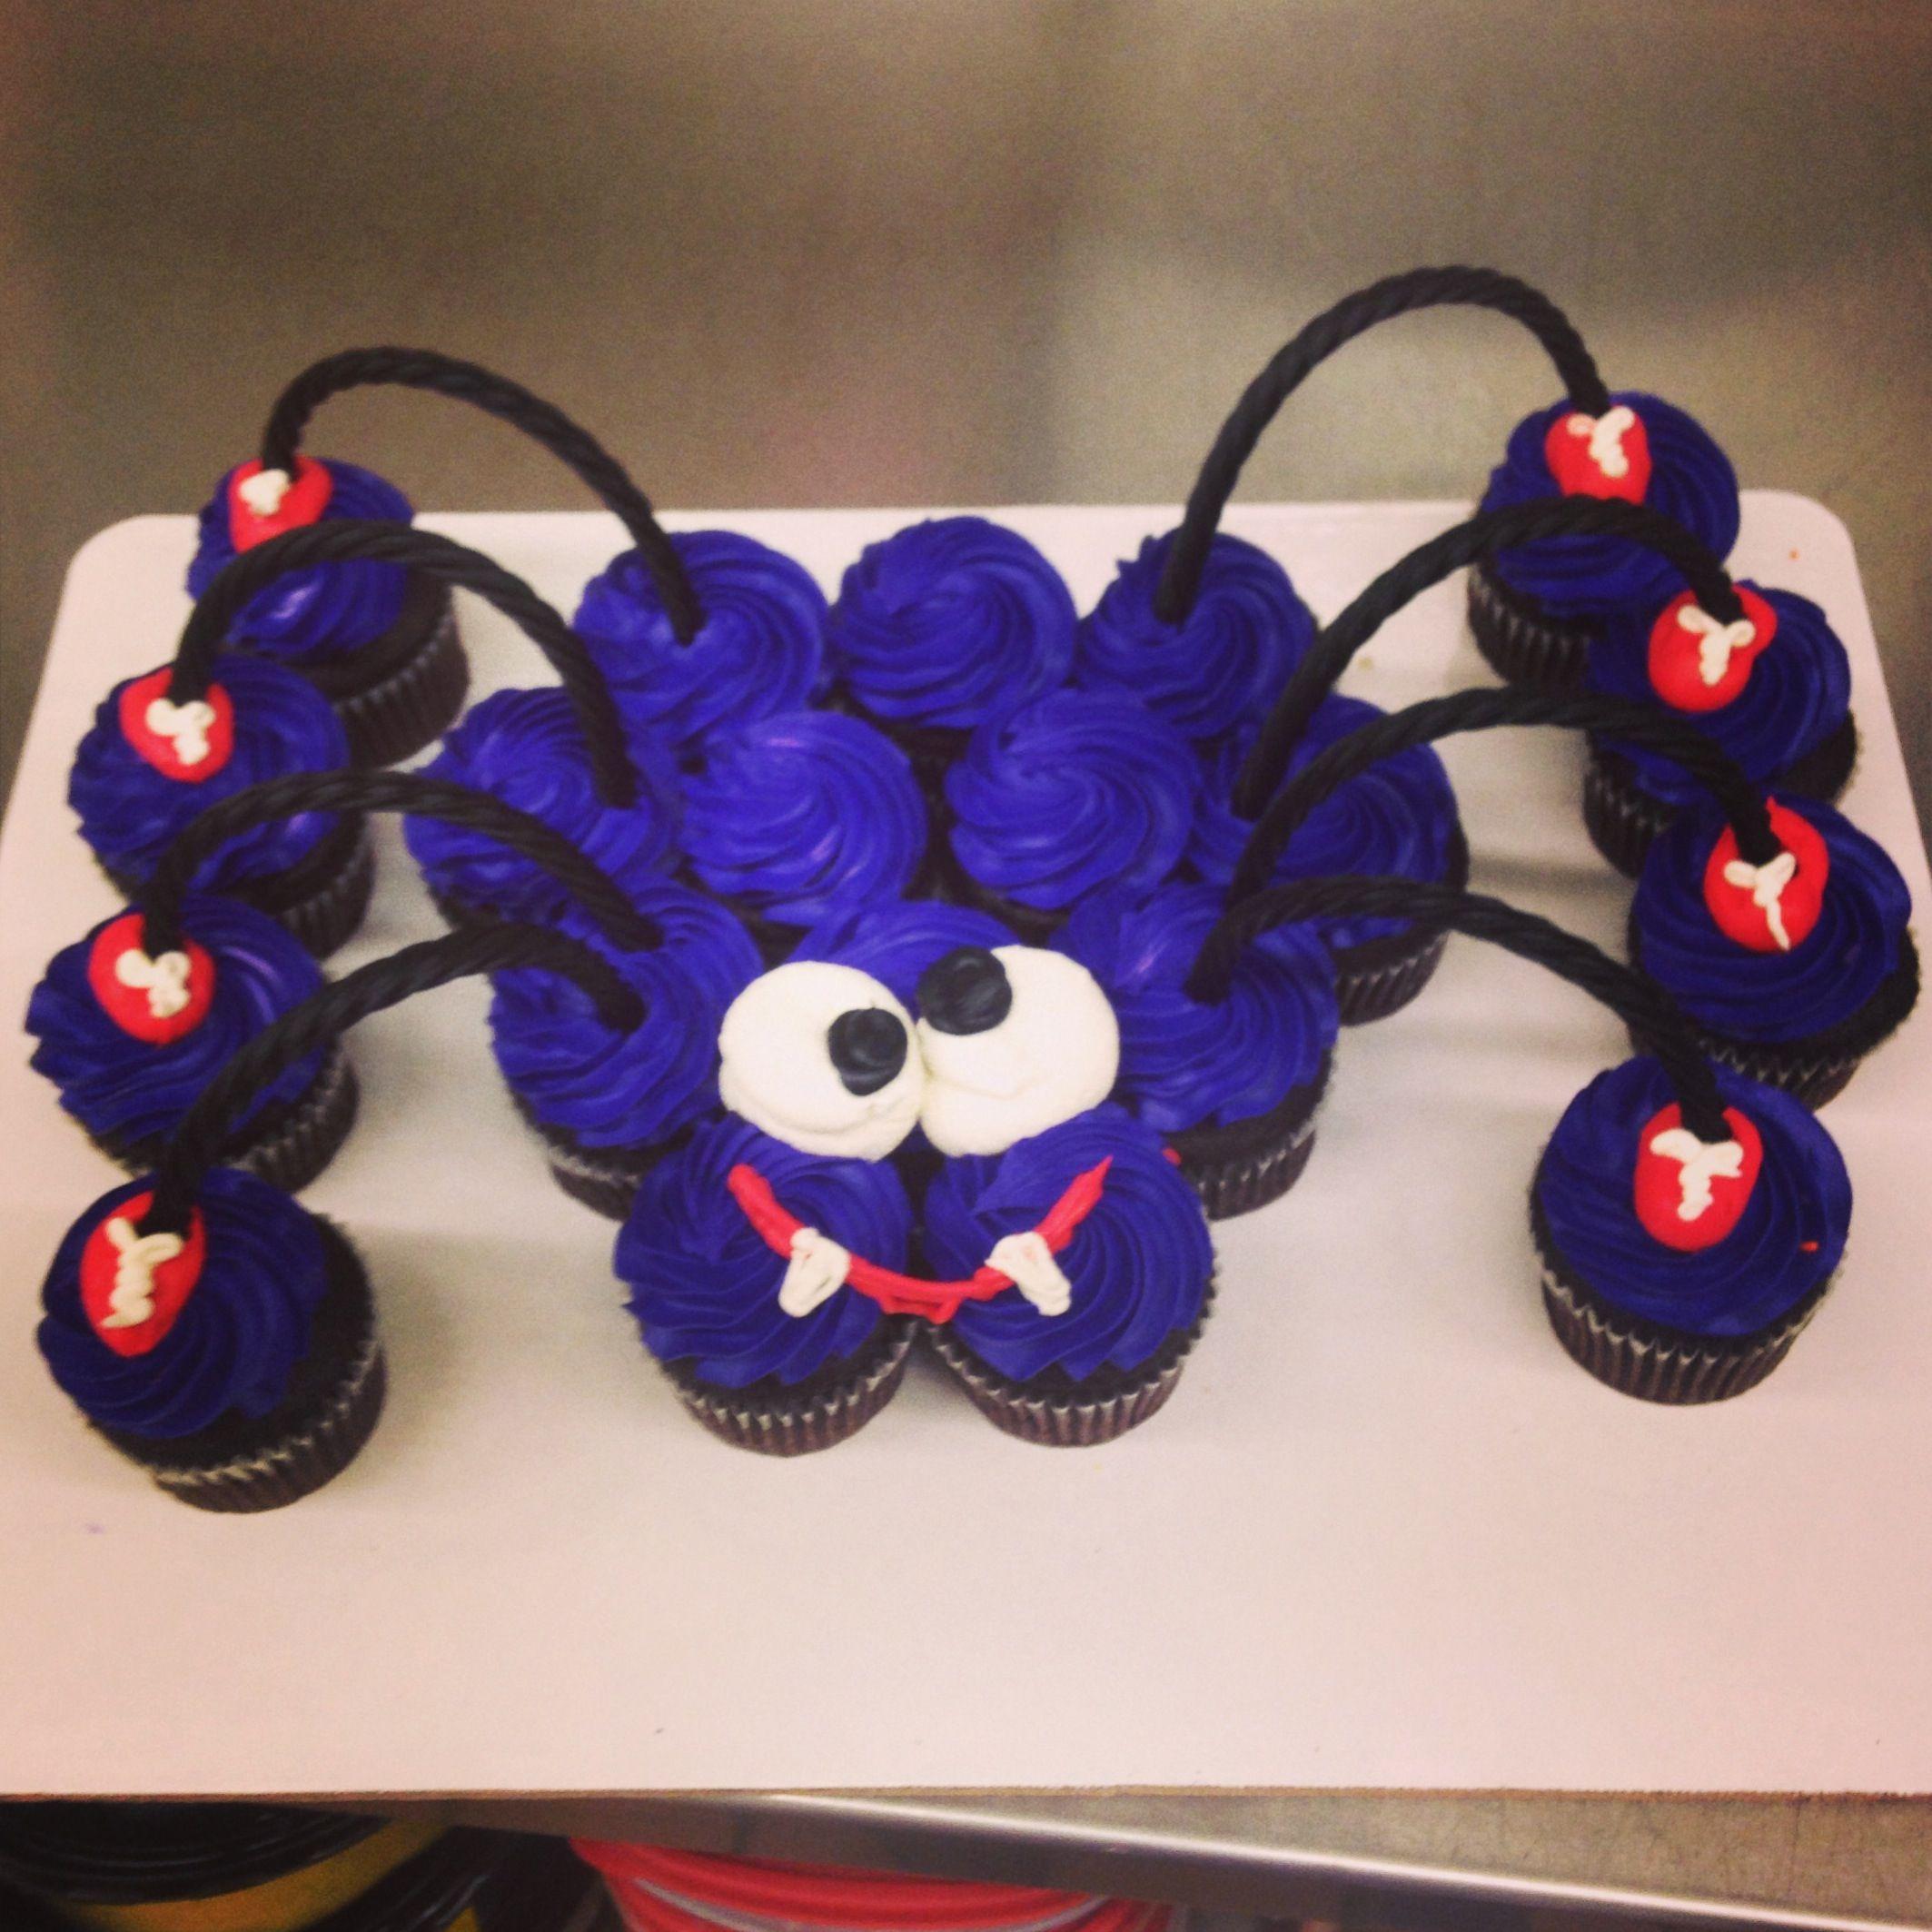 20 Yummy Halloween Cupcake Recipes | Halloween cakes, Halloween ...